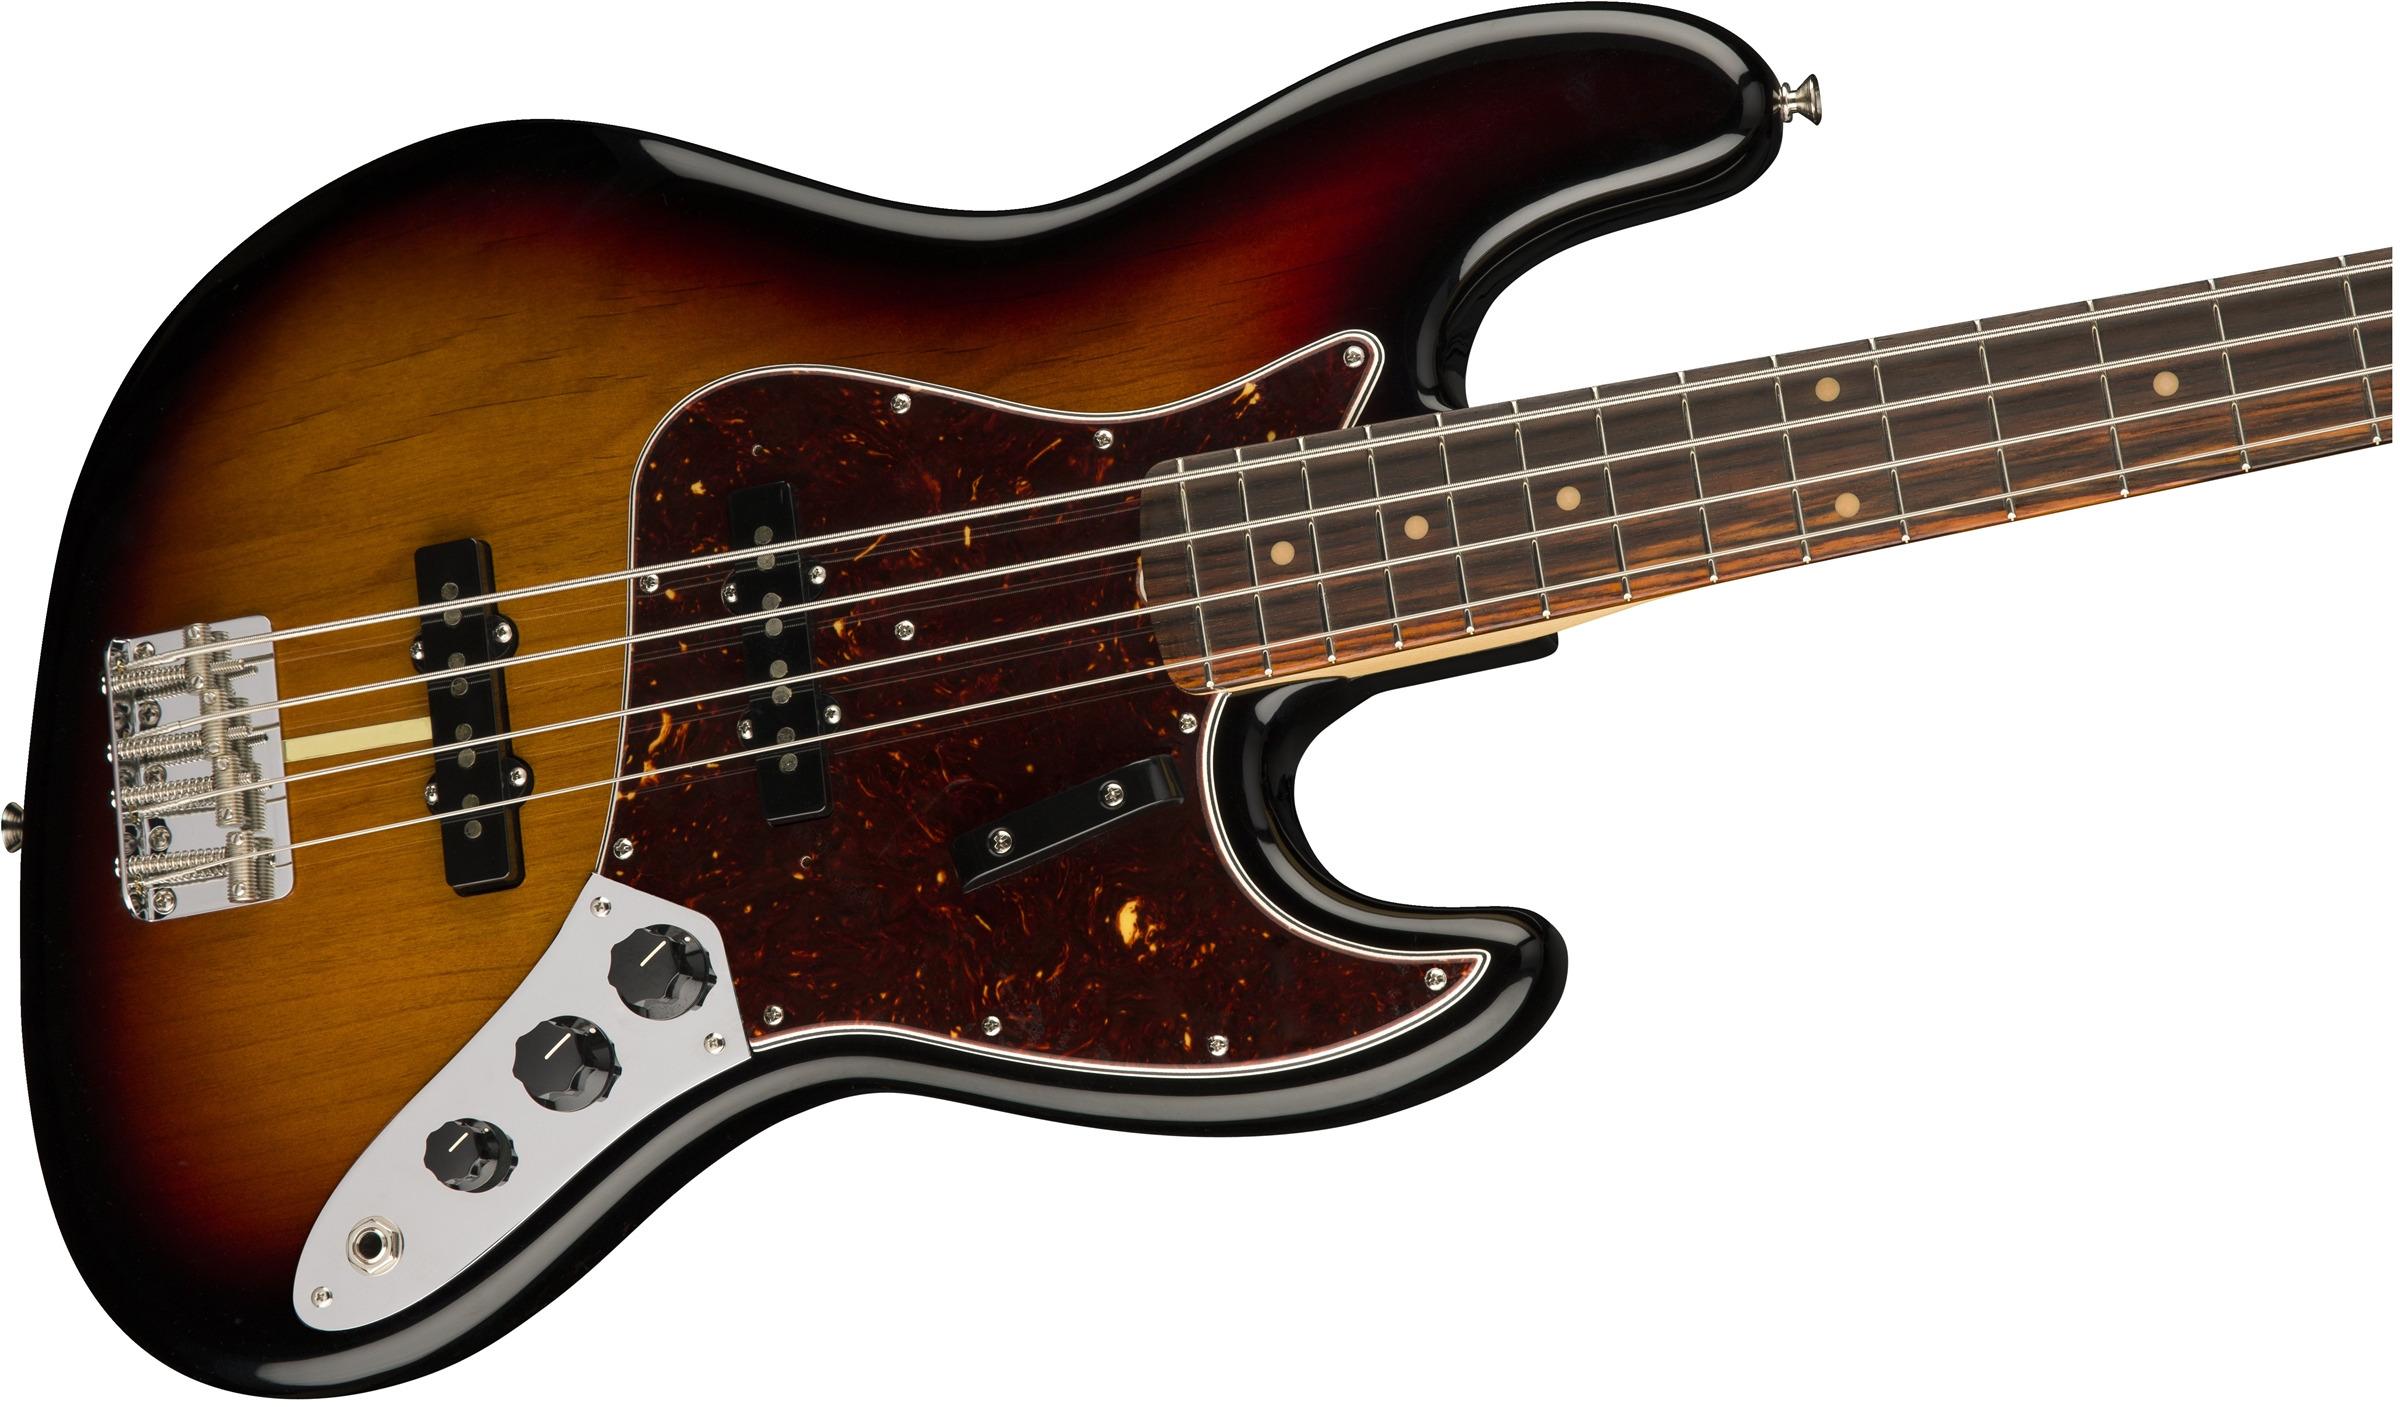 Fender JBASS-AMORG-60-RW American Original '60s Jazz Bass with Rosewood Fingerboard JBASS-AMORG-60-RW